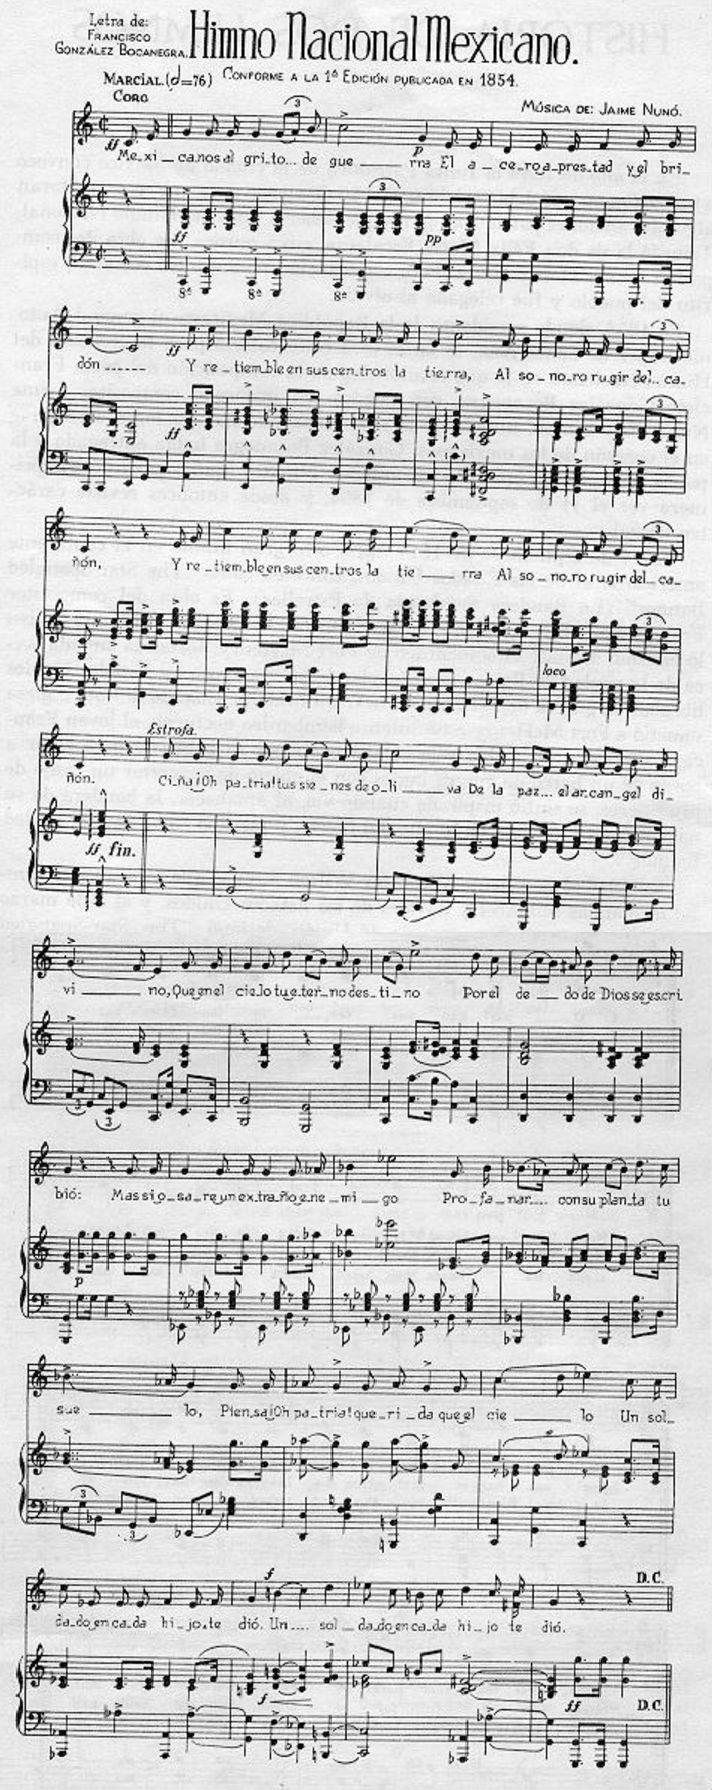 Partitura del Himno Nacional Méxicano / Sheet music of the Mexican National Anthem